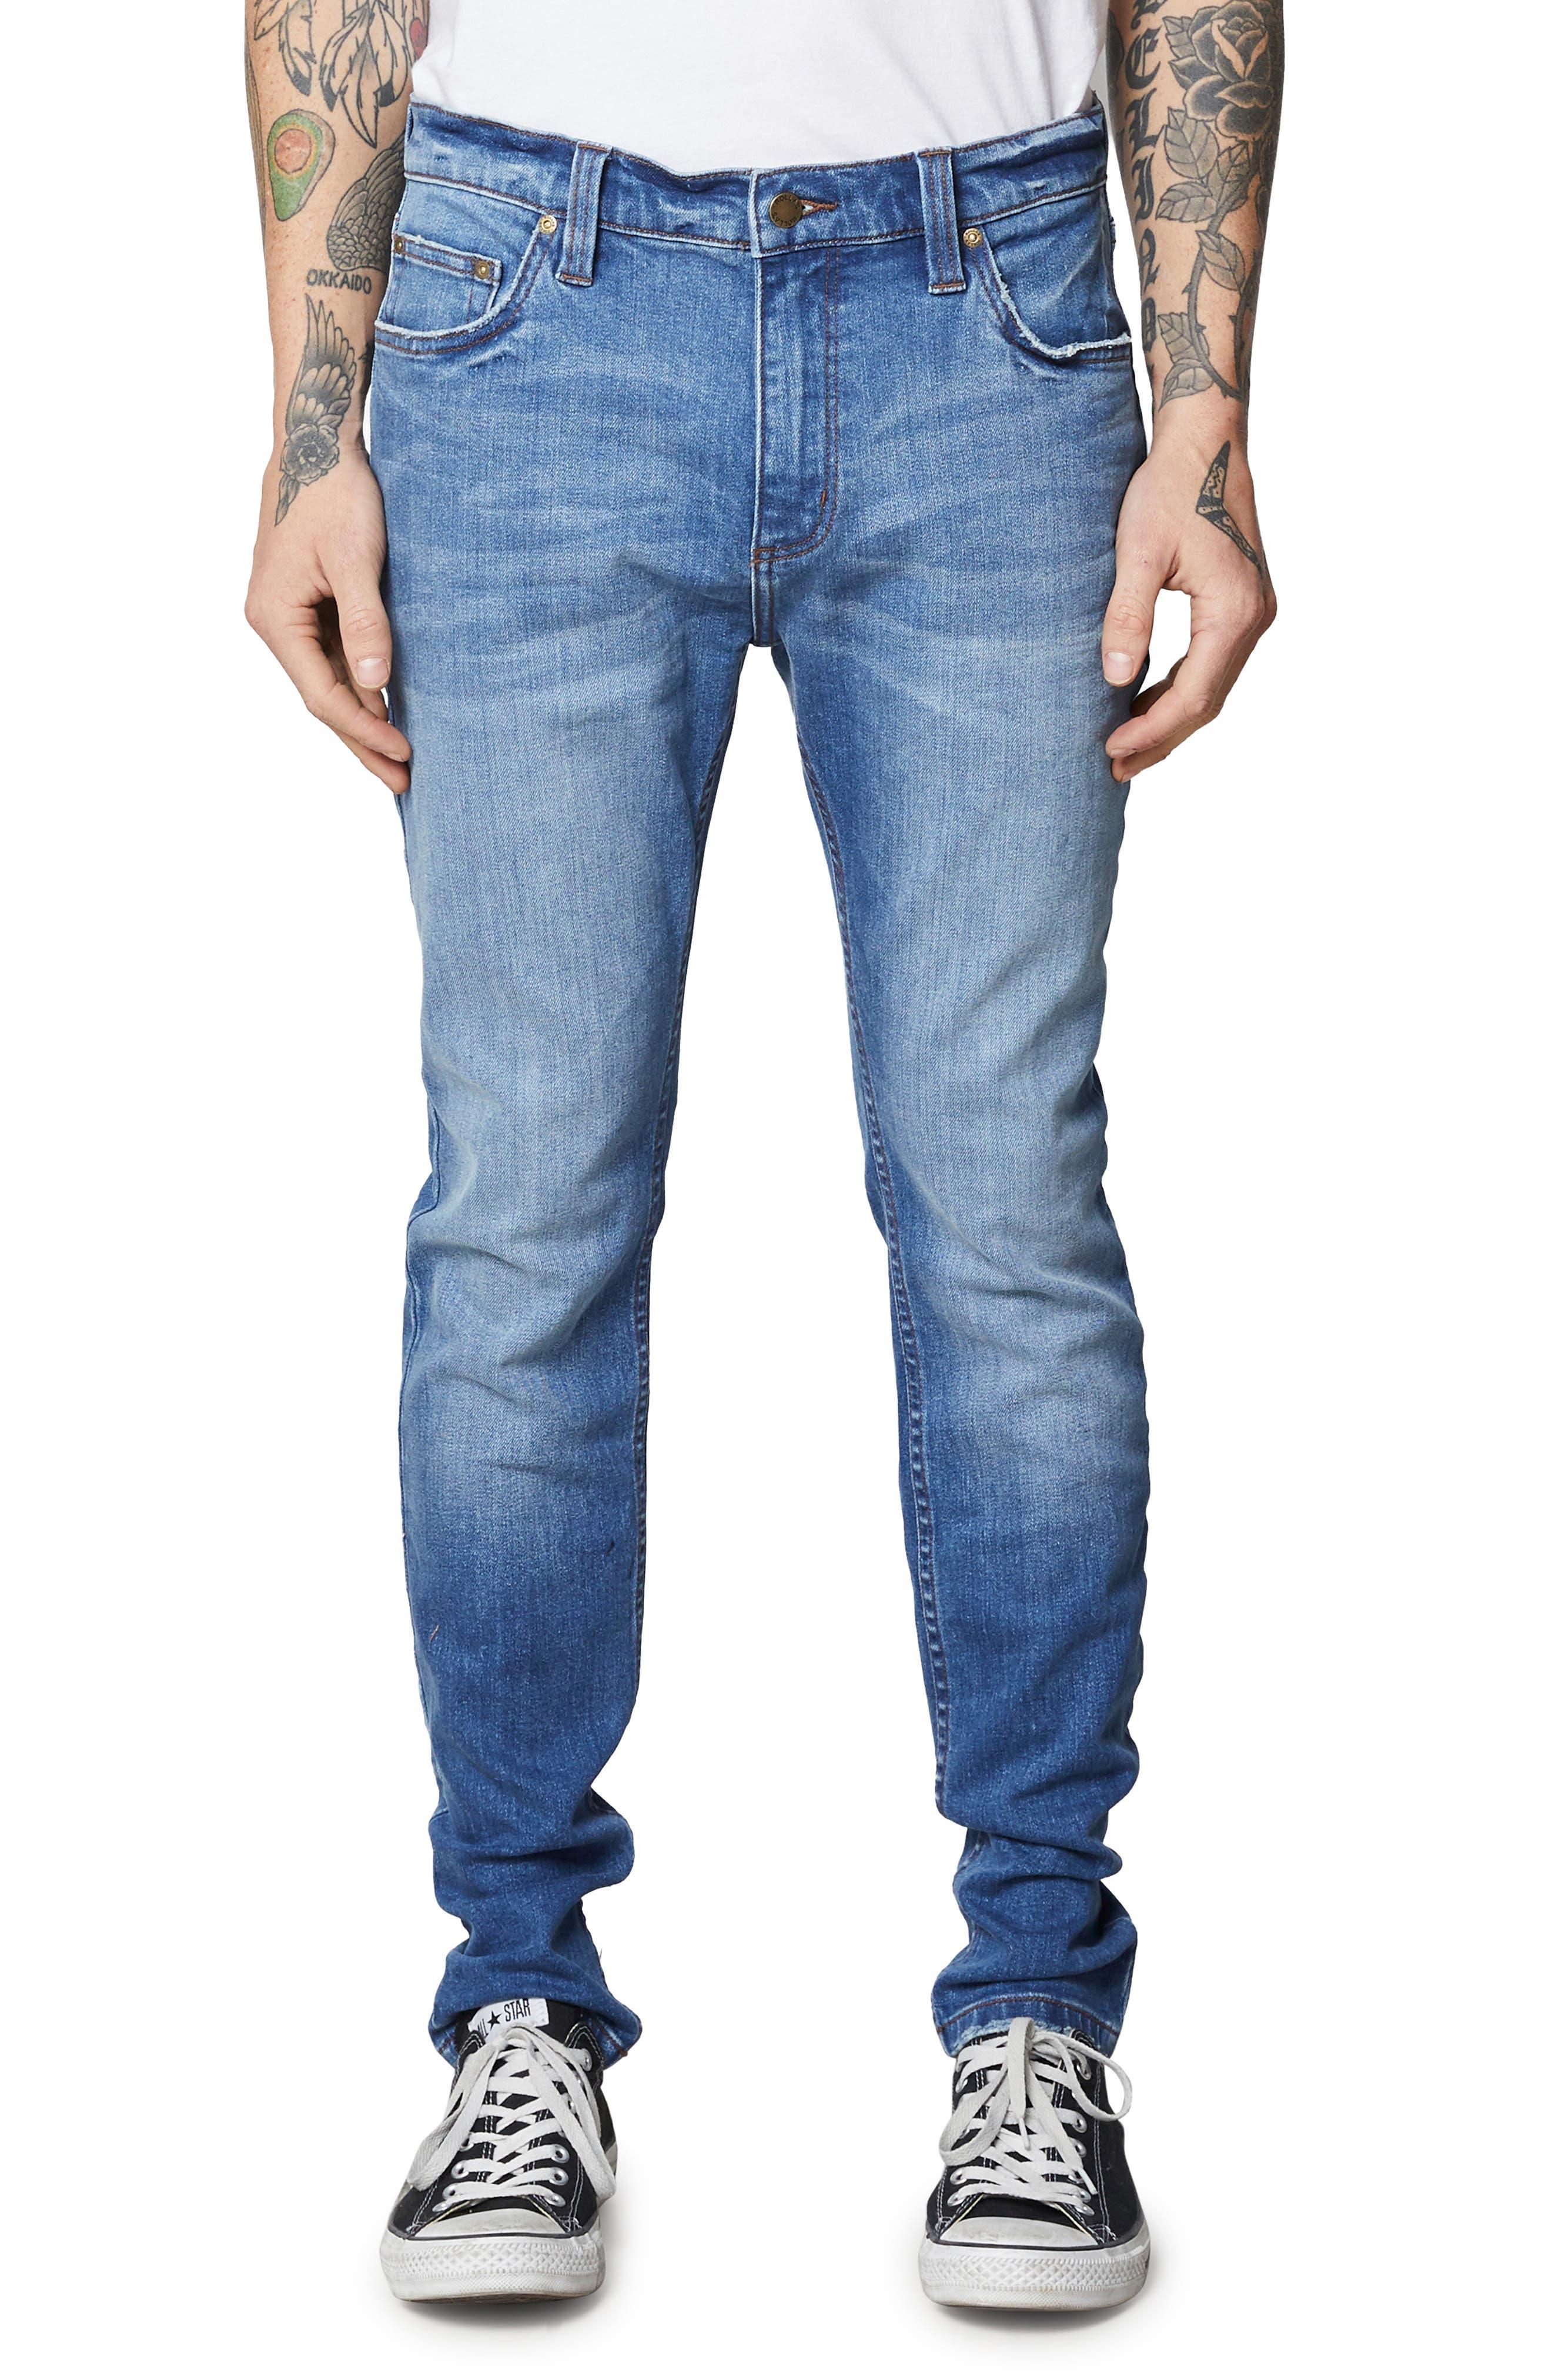 Stinger Skinny Fit Jeans,                             Main thumbnail 1, color,                             HOMESPUN CRUSH